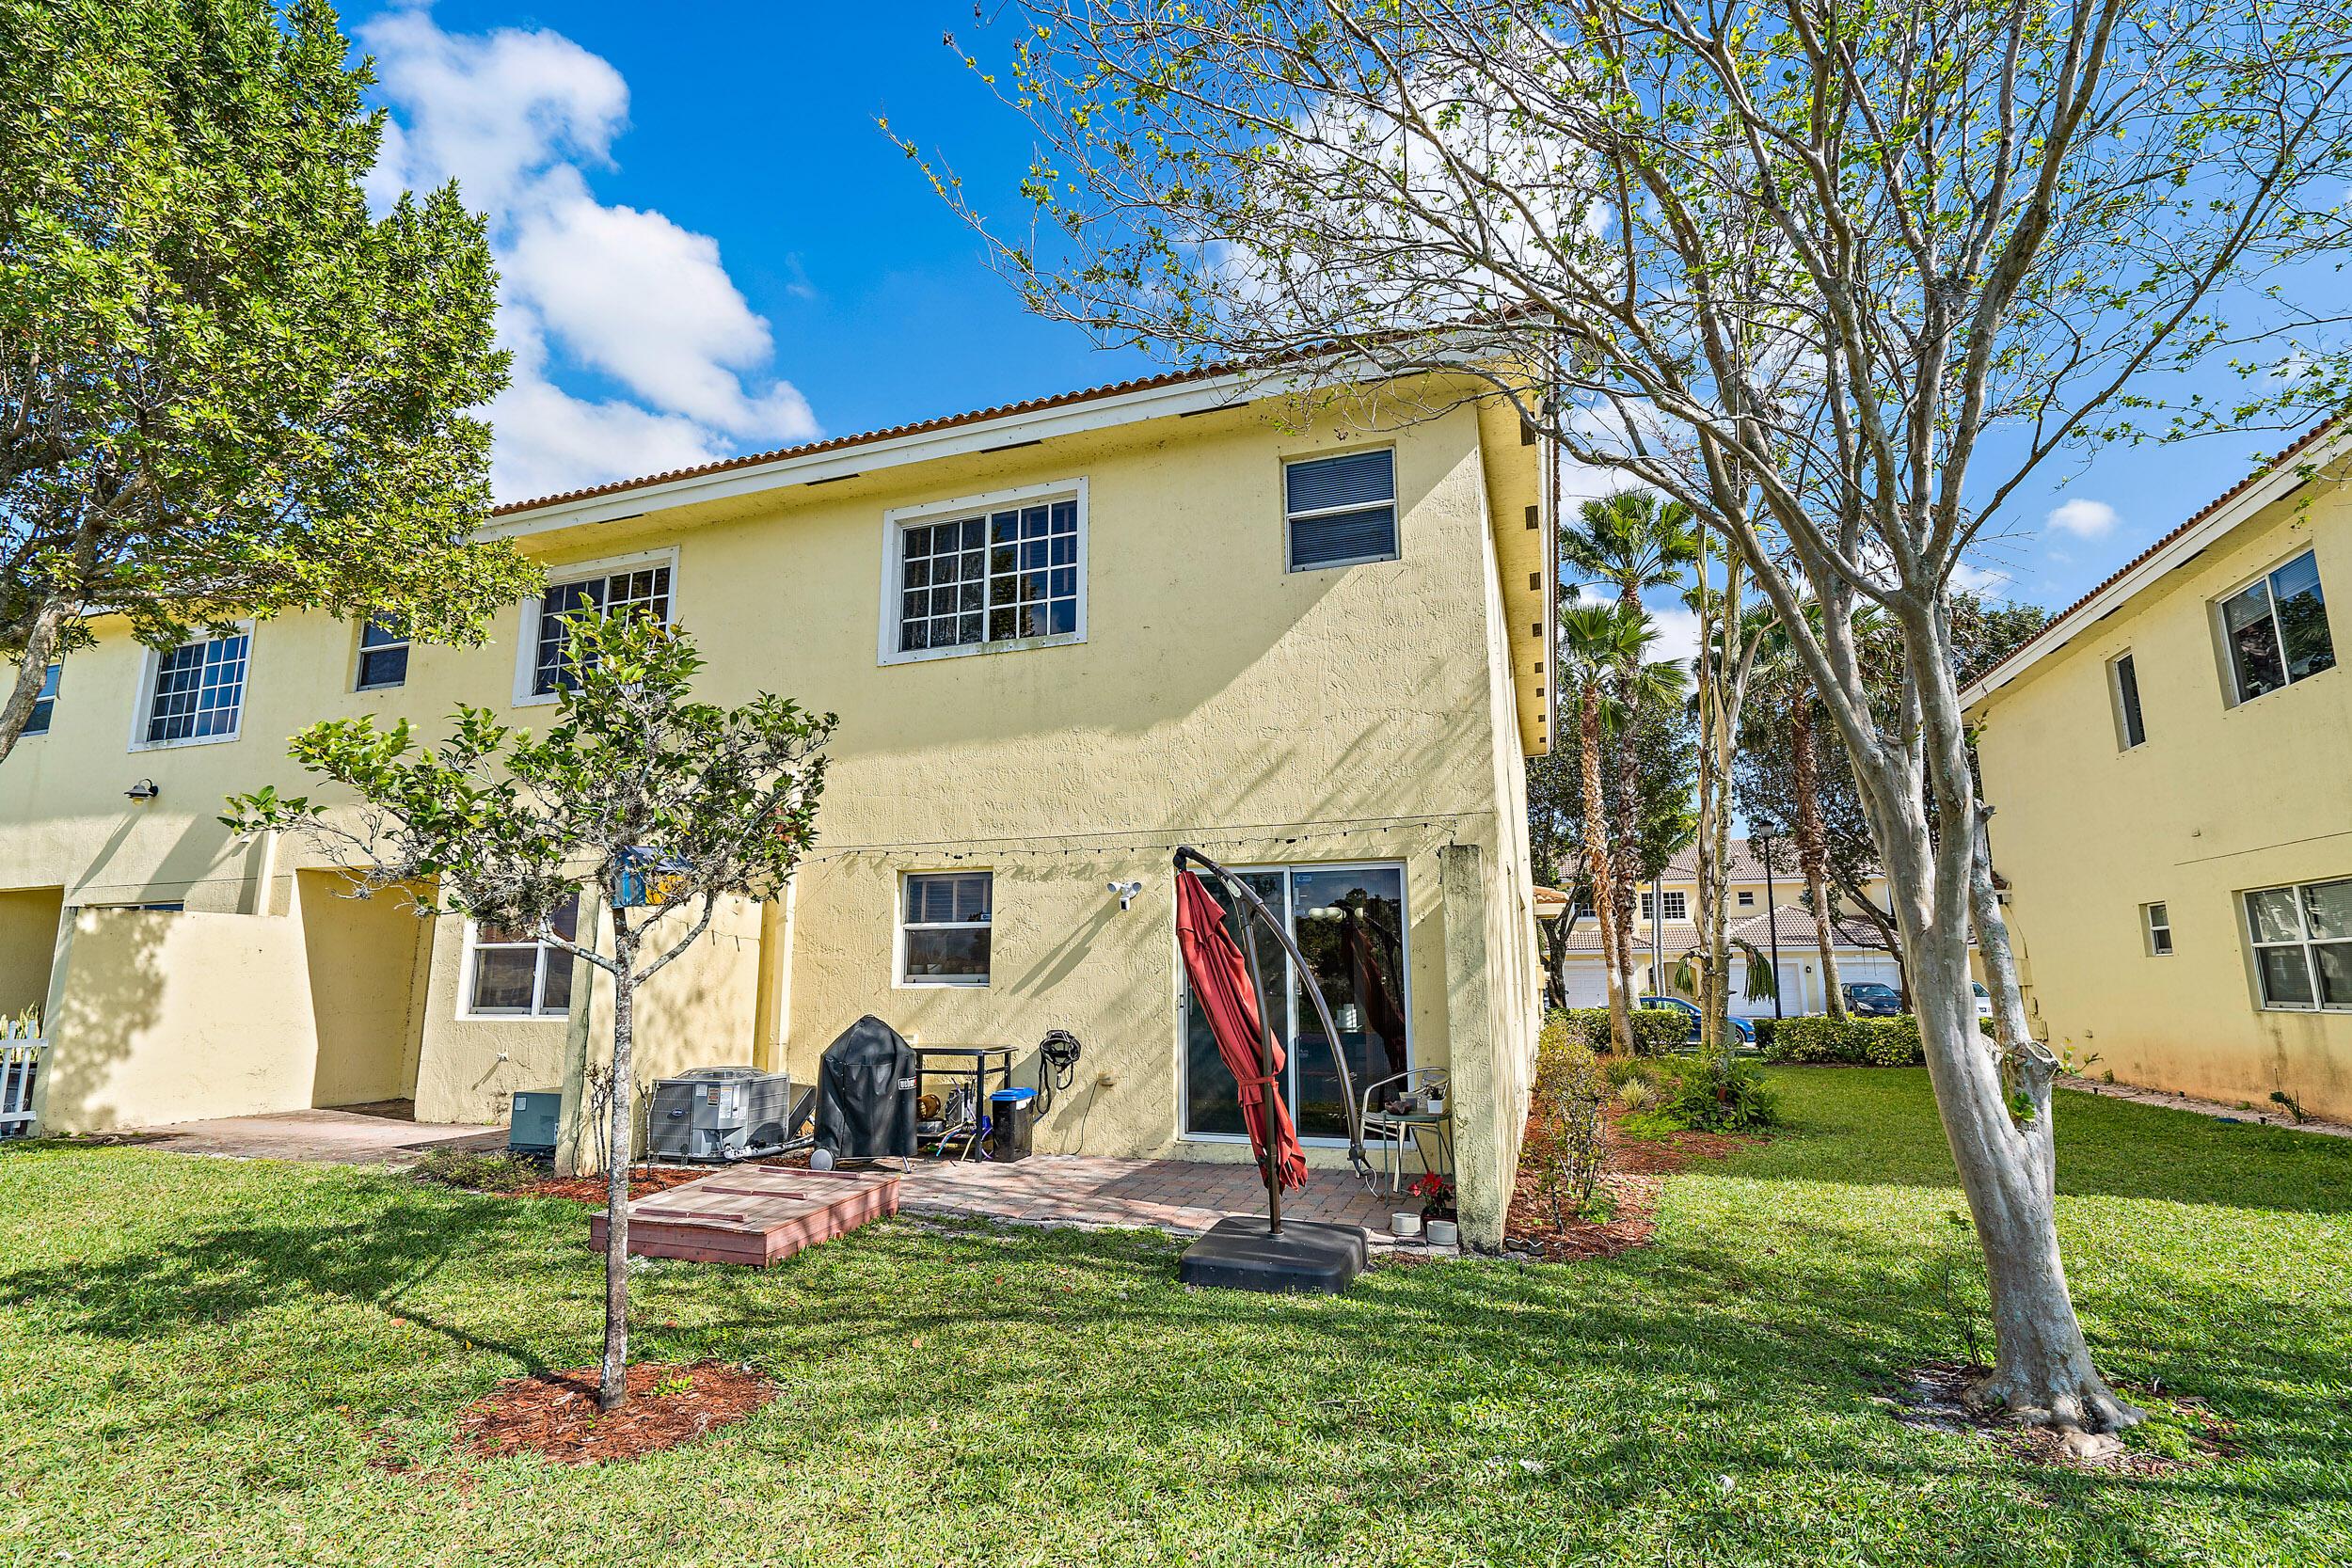 1150 Imperial Lake Road - 33413 - FL - West Palm Beach